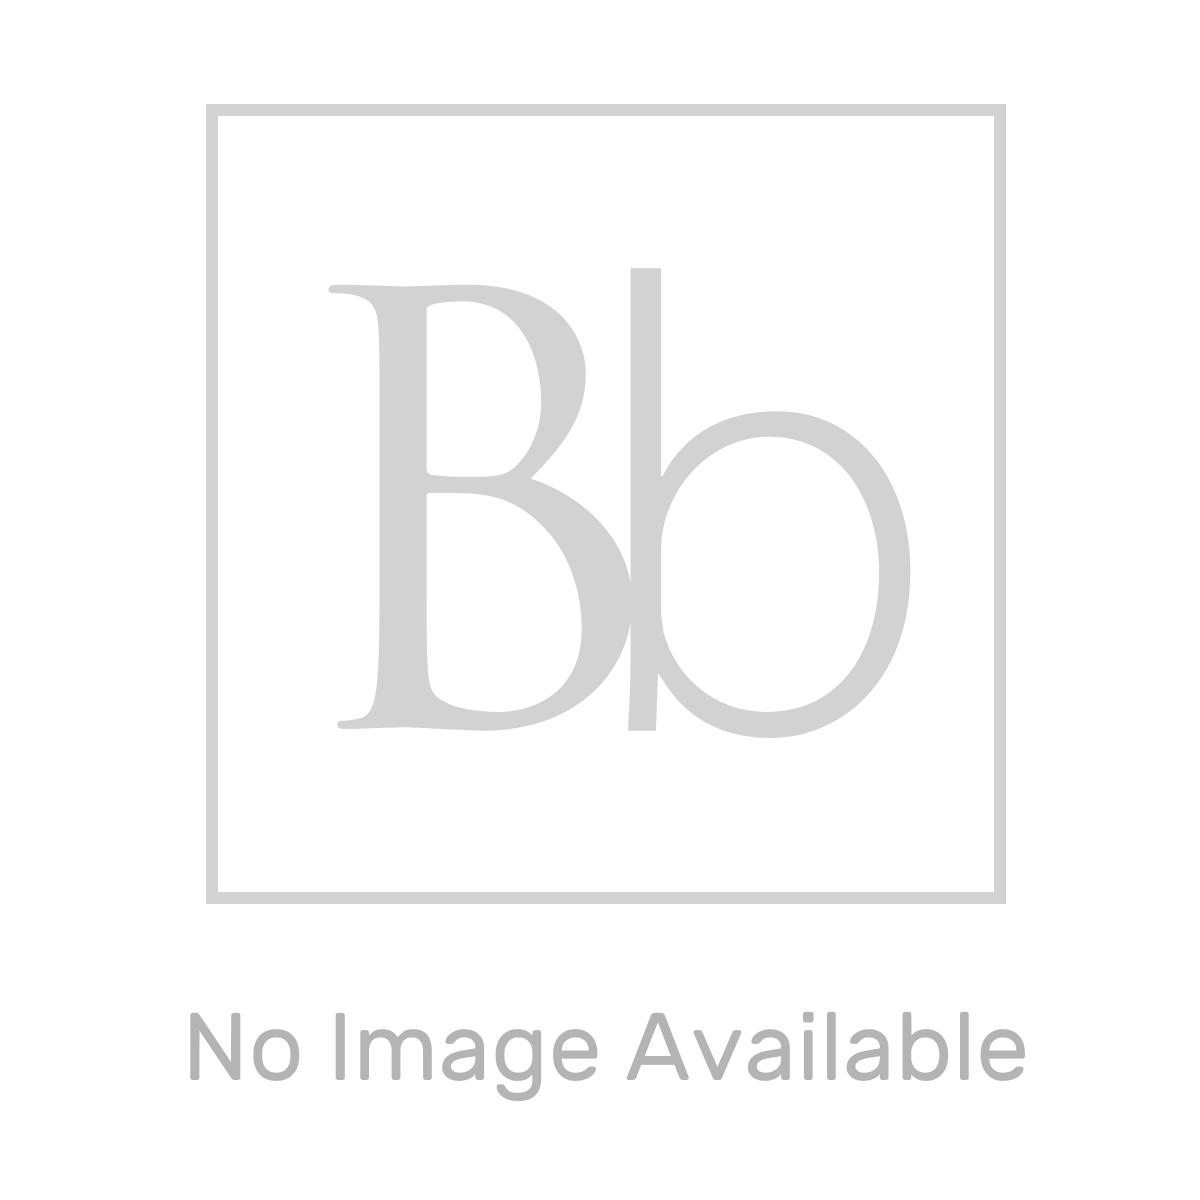 Croydex Parkgate Brushed Stainless Steel Rectangular Mirror